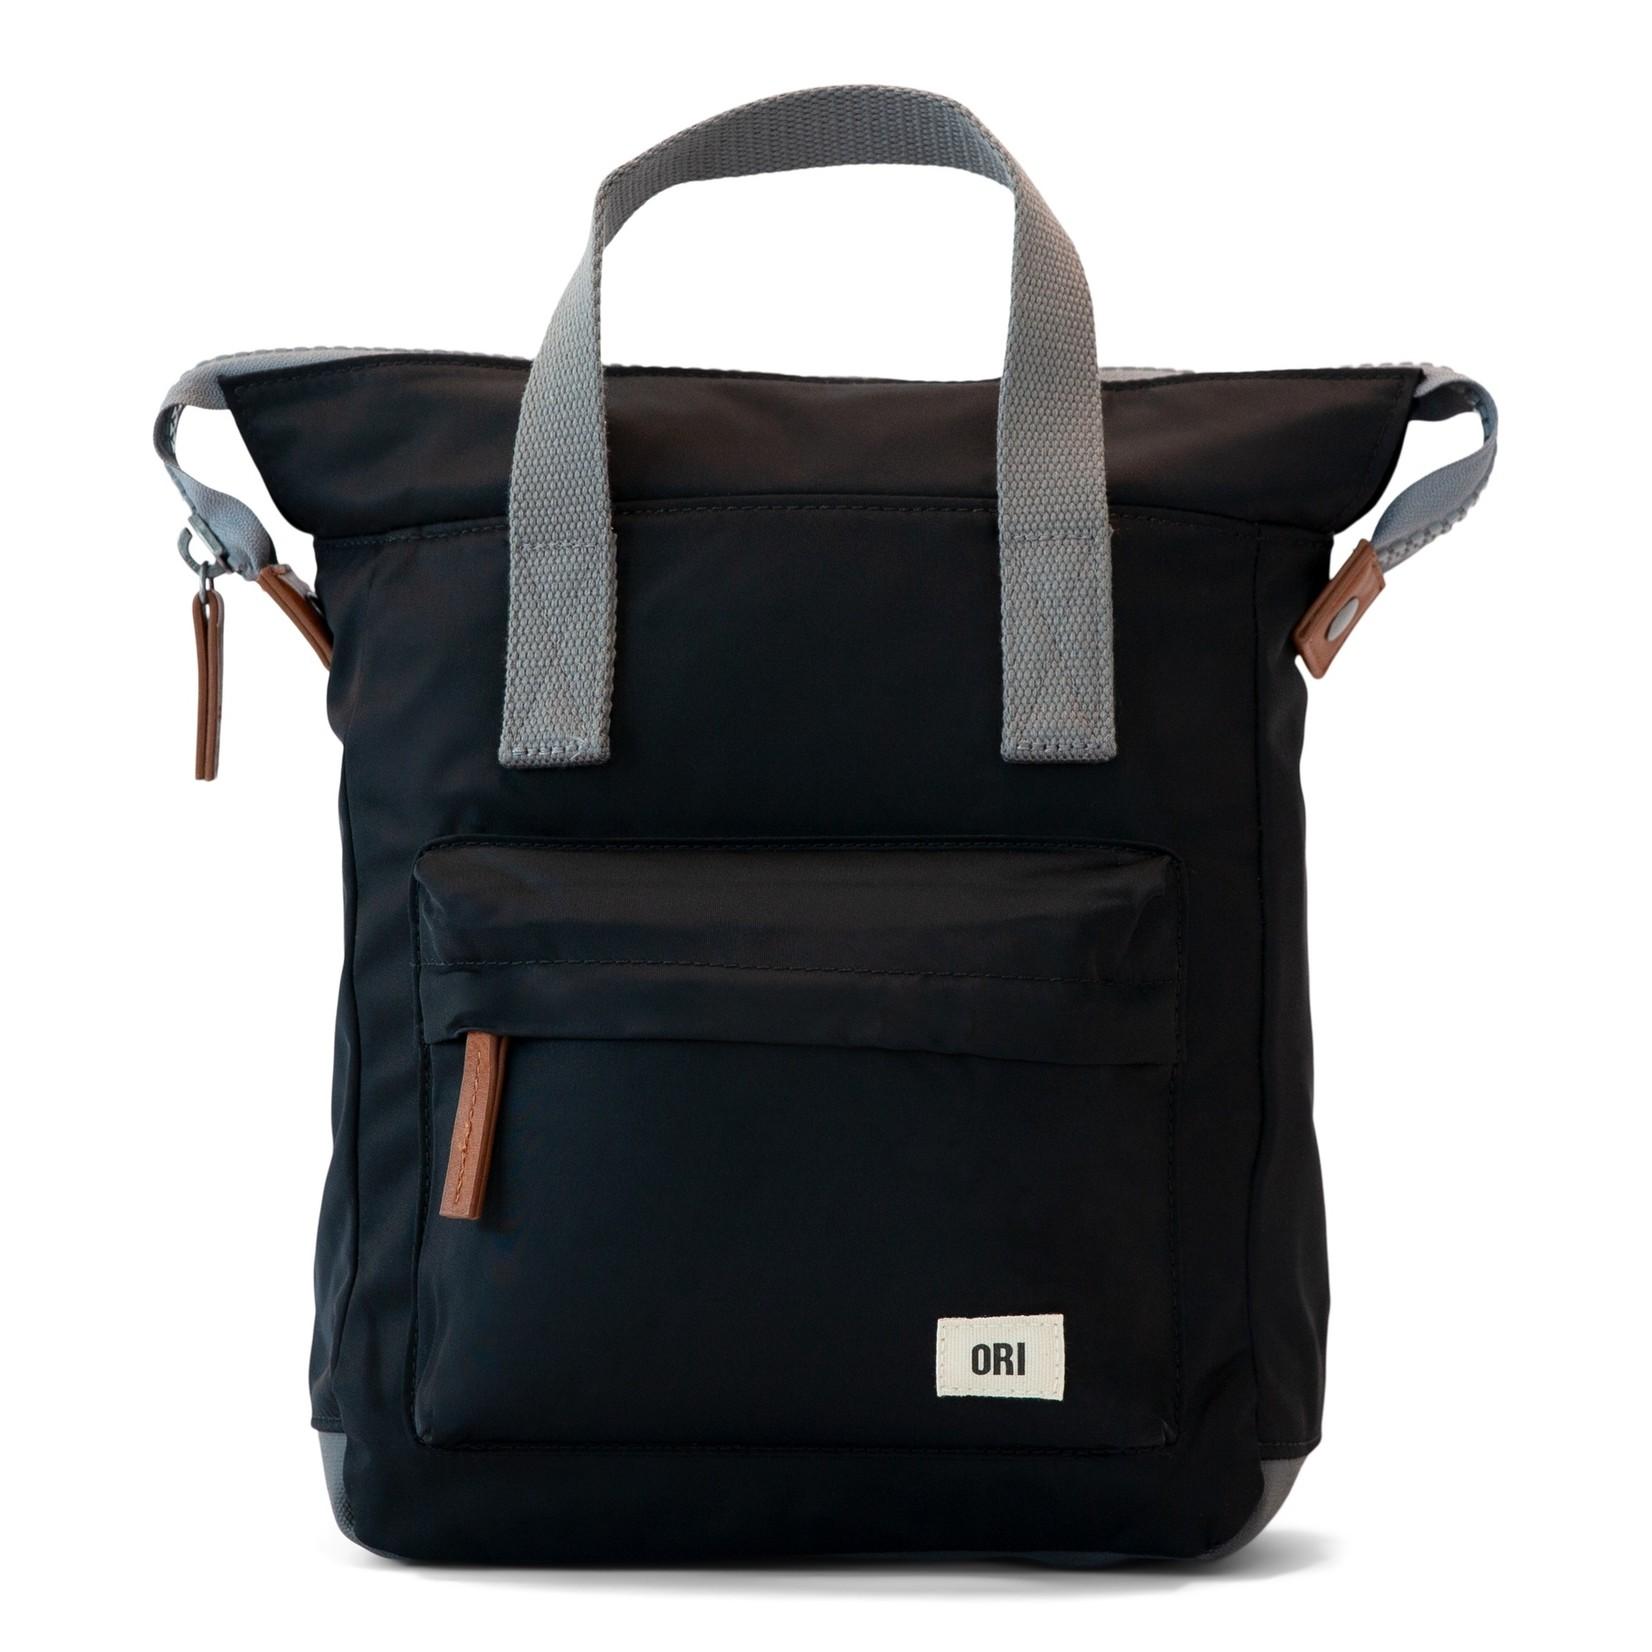 Ori London Bantry B Medium Sustainable Backpack Black